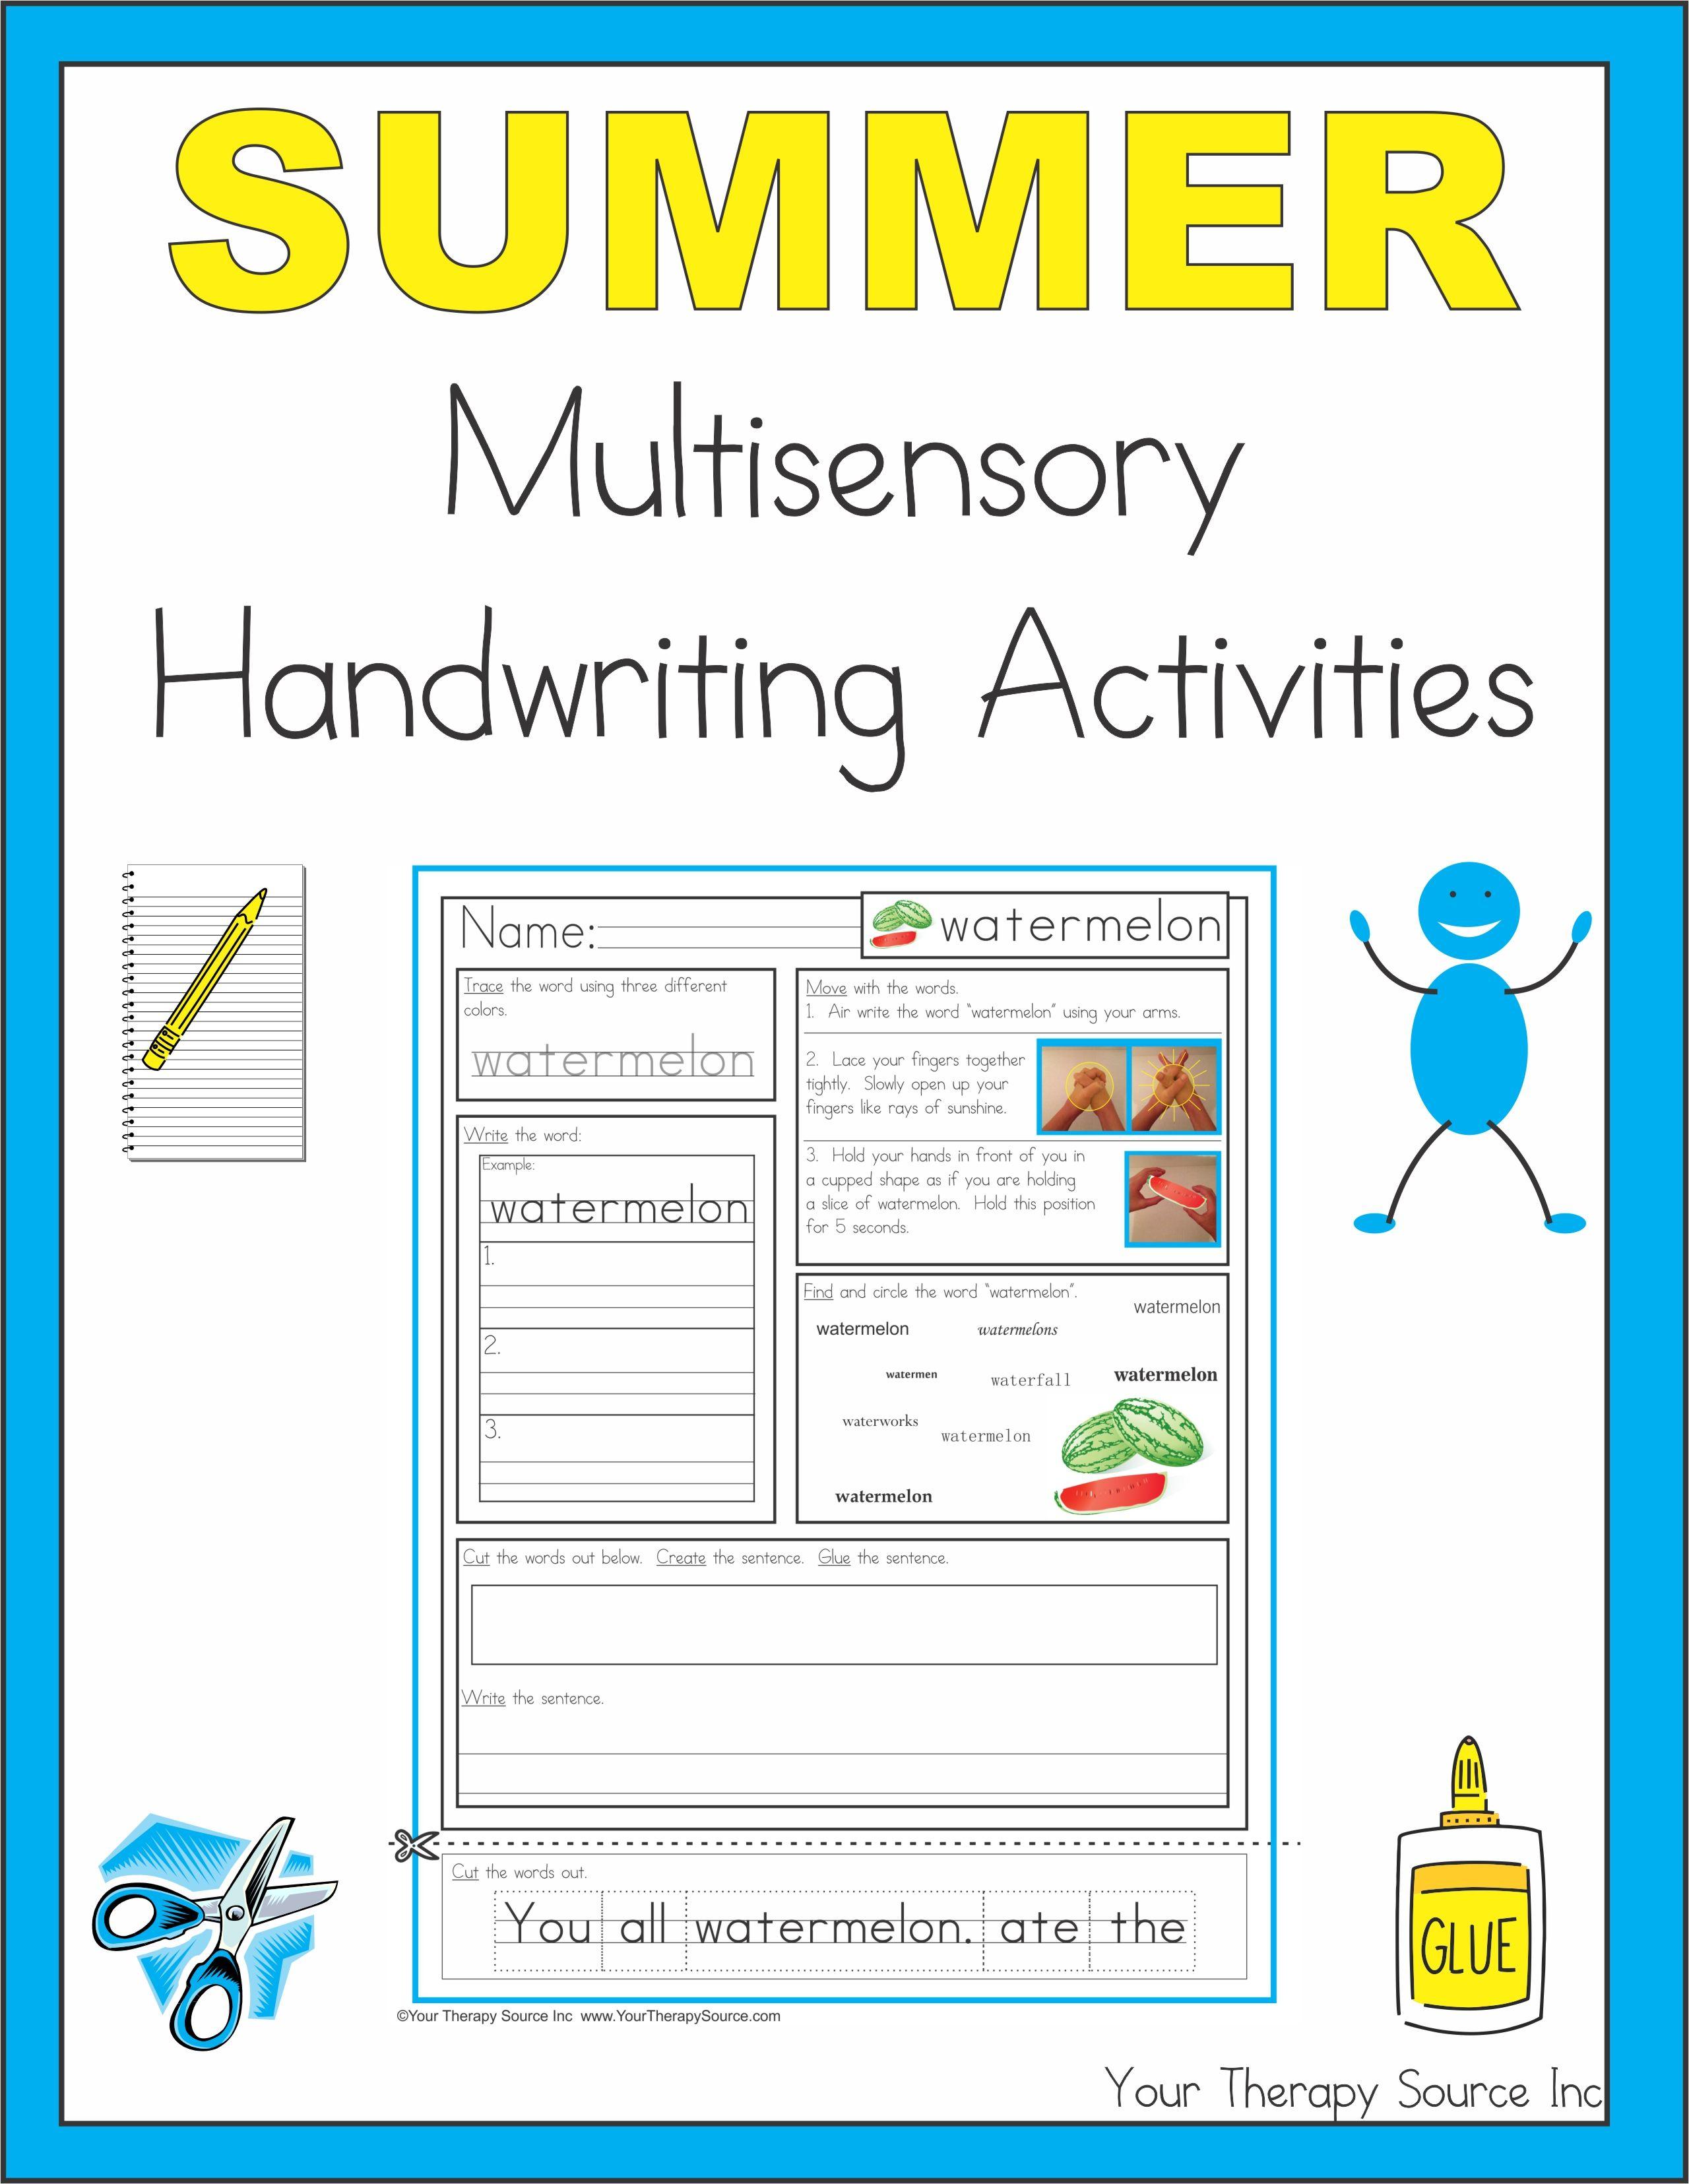 Summer Multisensory Handwriting Activities